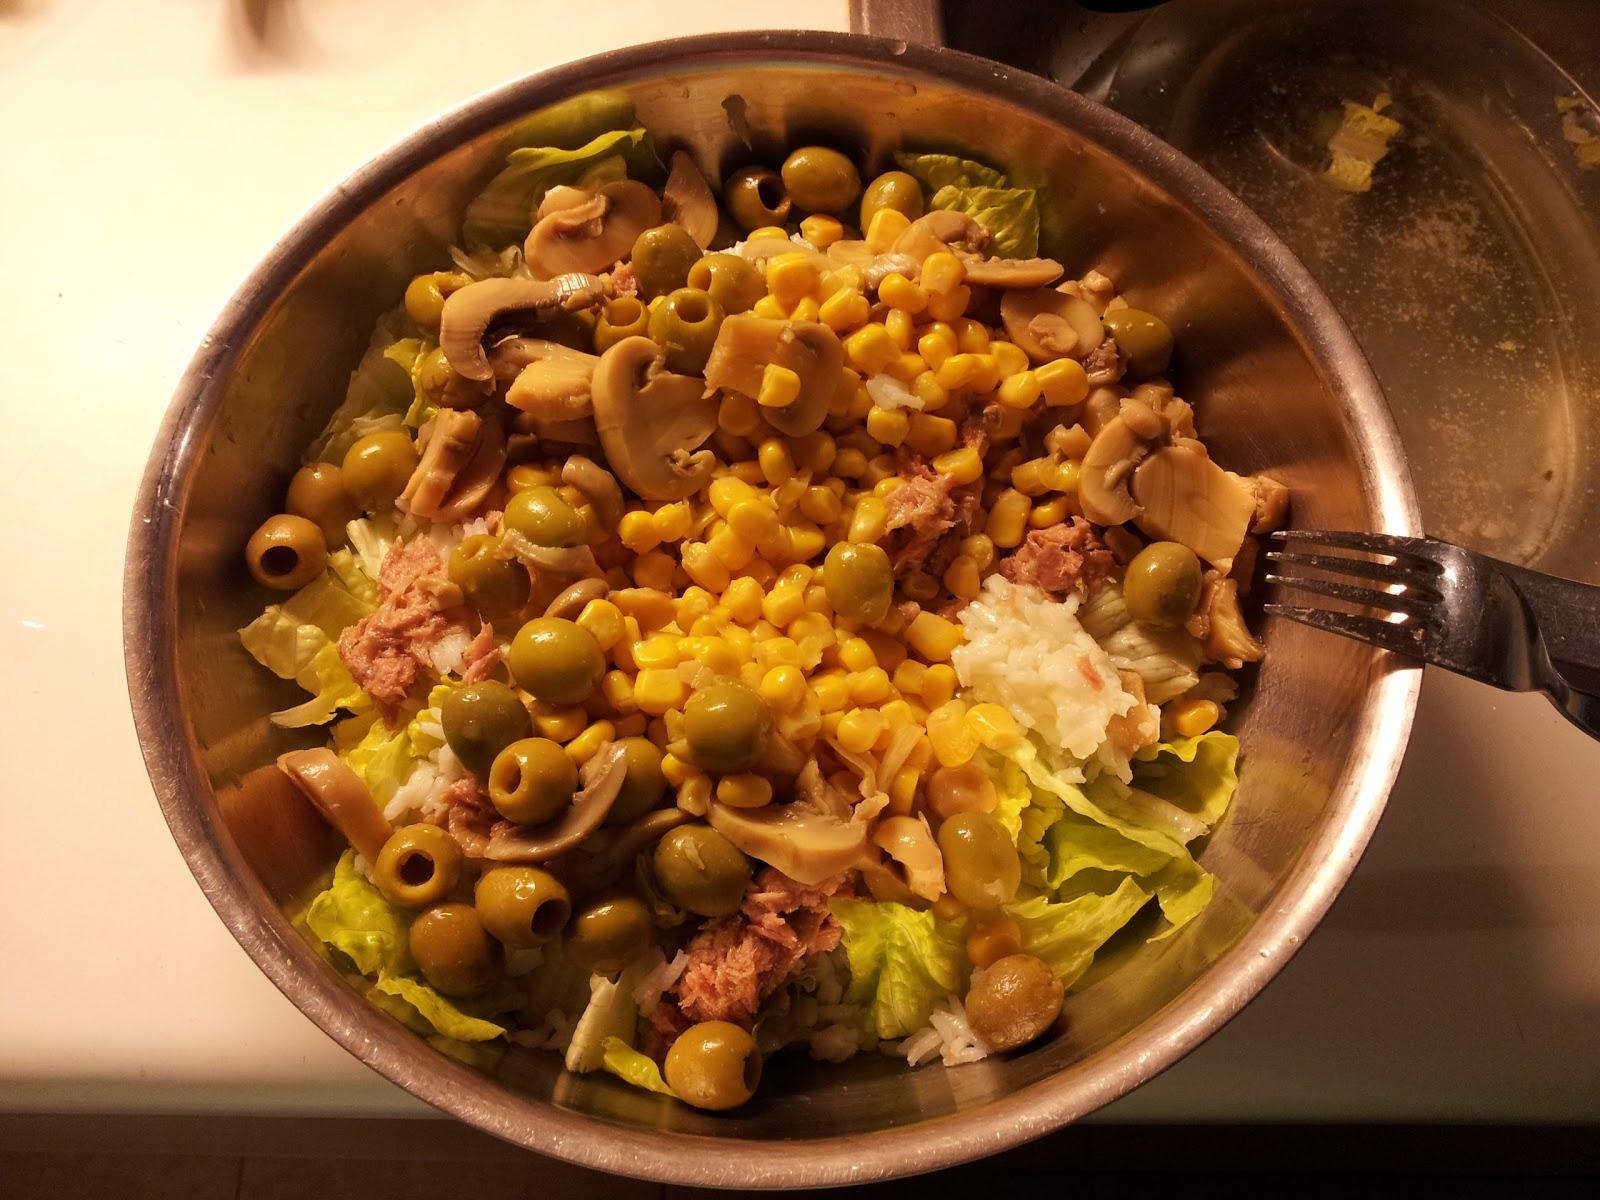 Ensalada de arroz esta el horno para bollos - Ensalada de arroz light ...